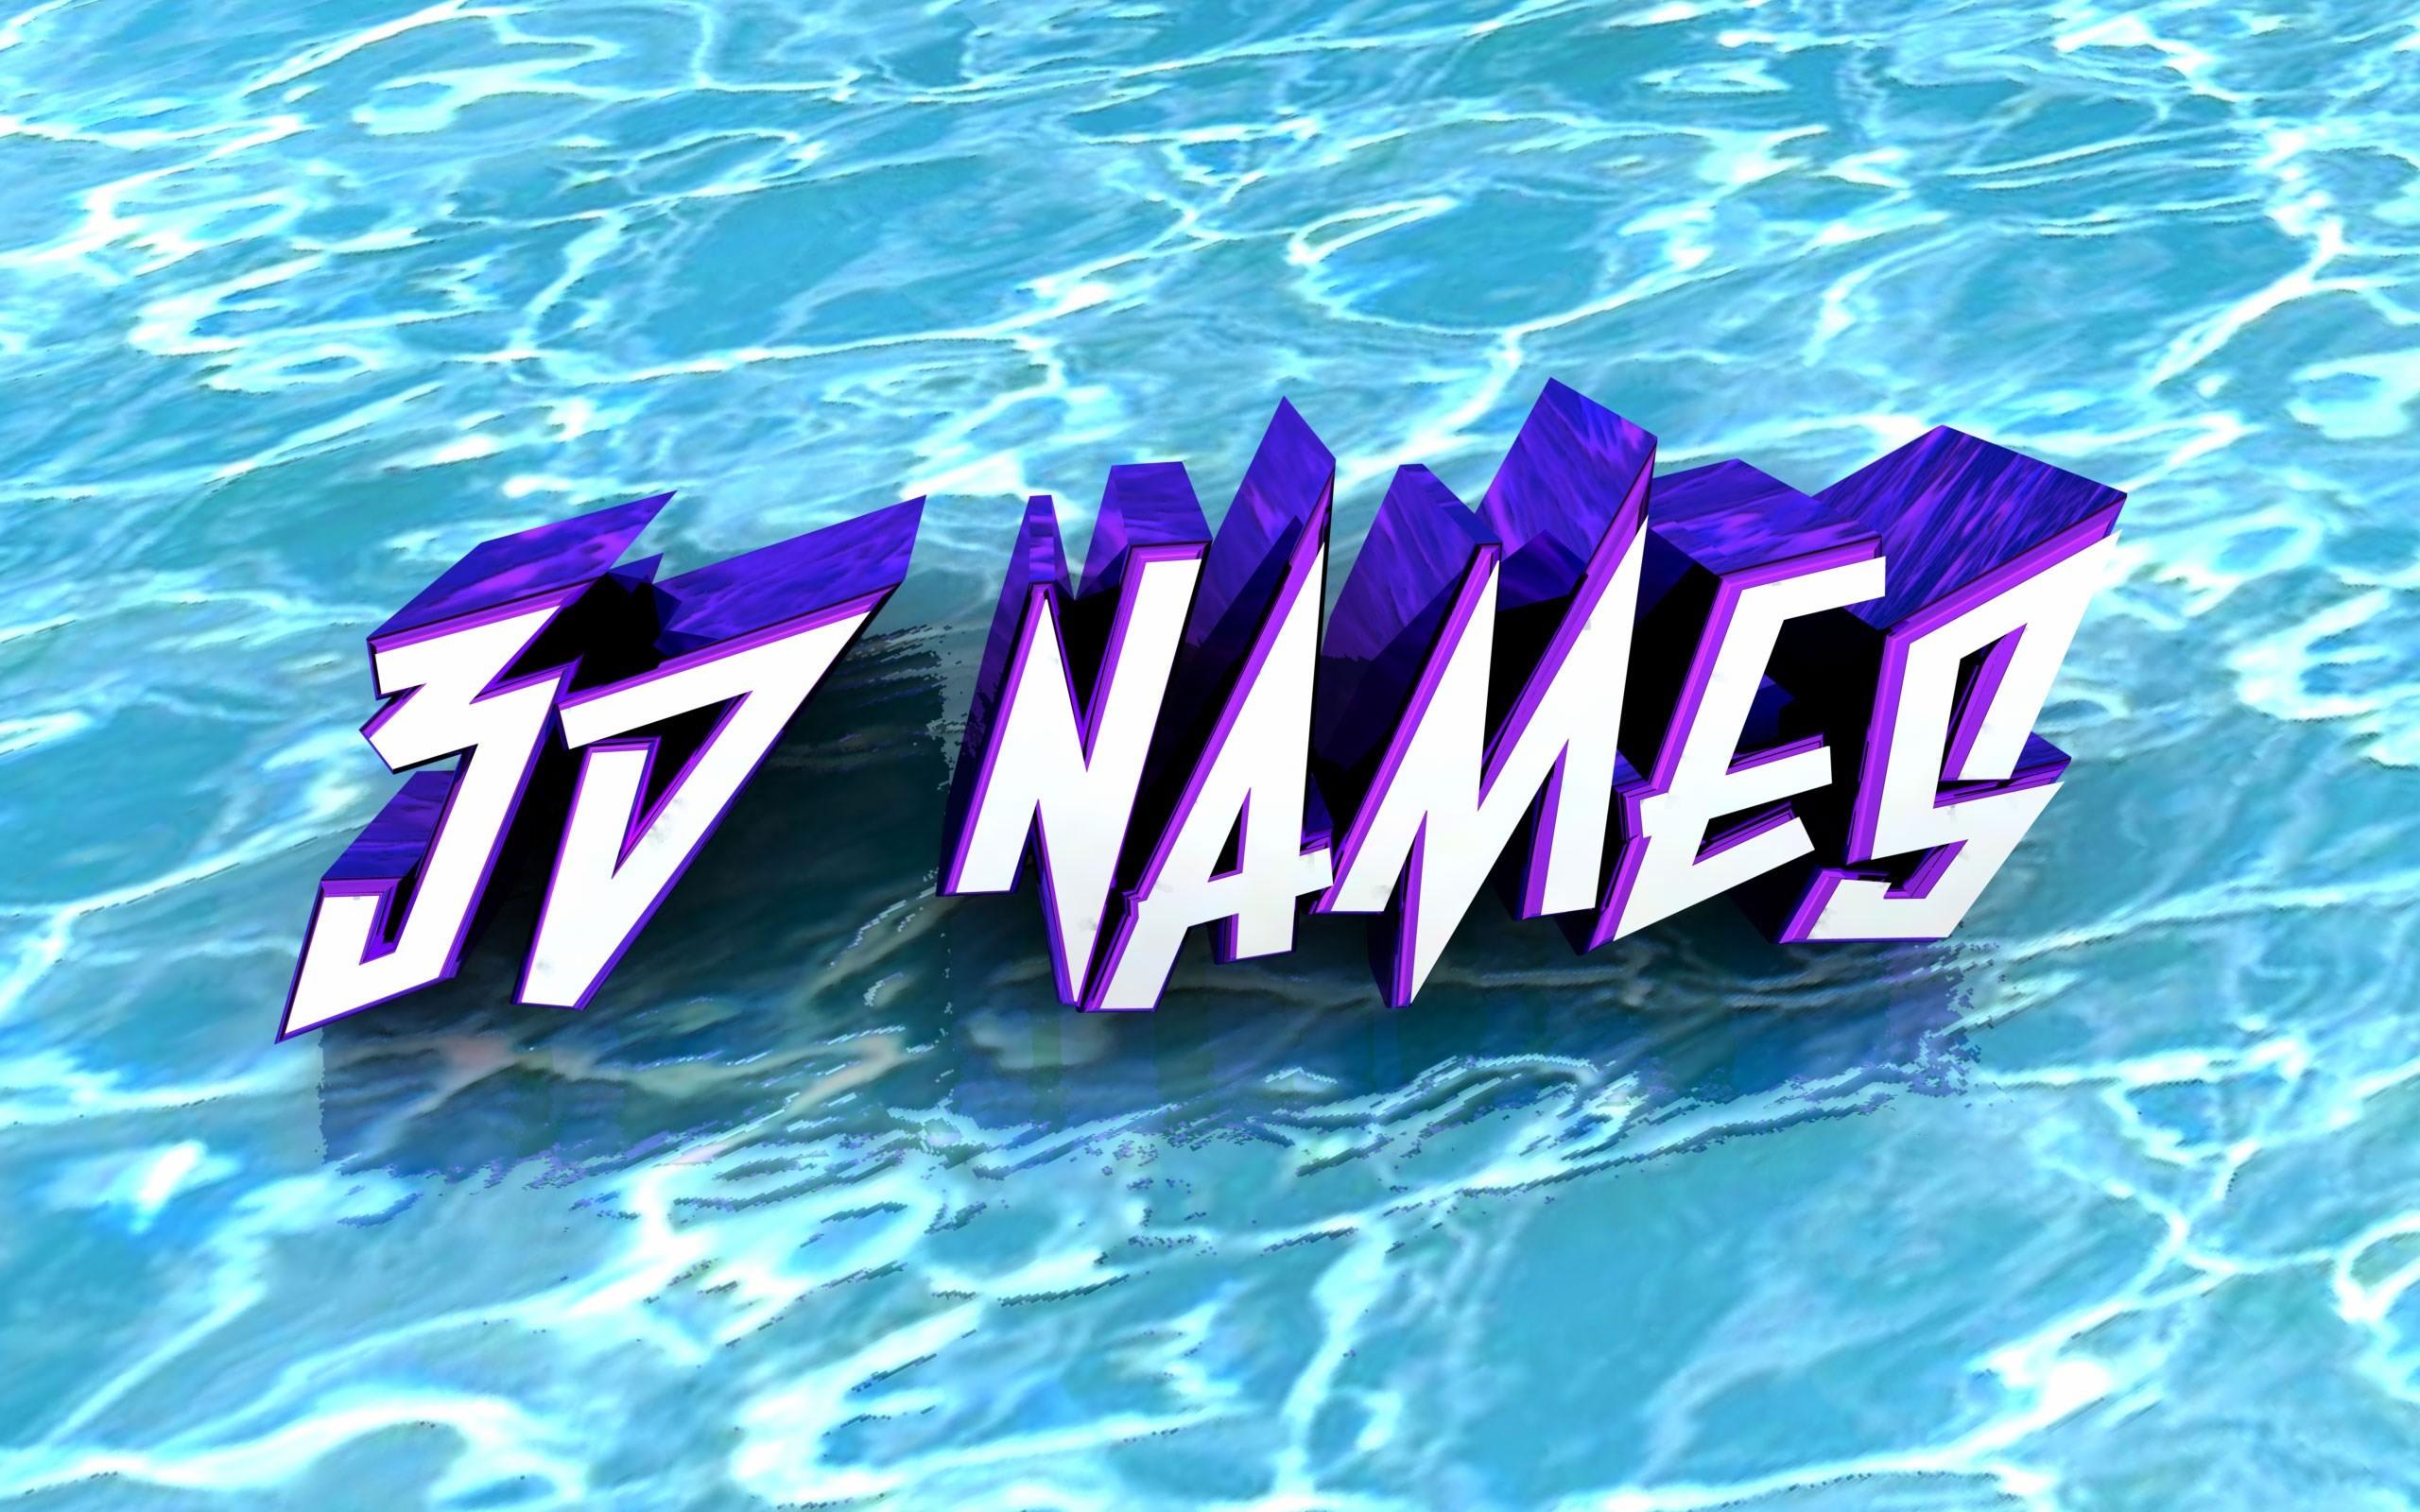 Amit Name 3d Wallpaper Download 3d Name Wallpaper 183 ①